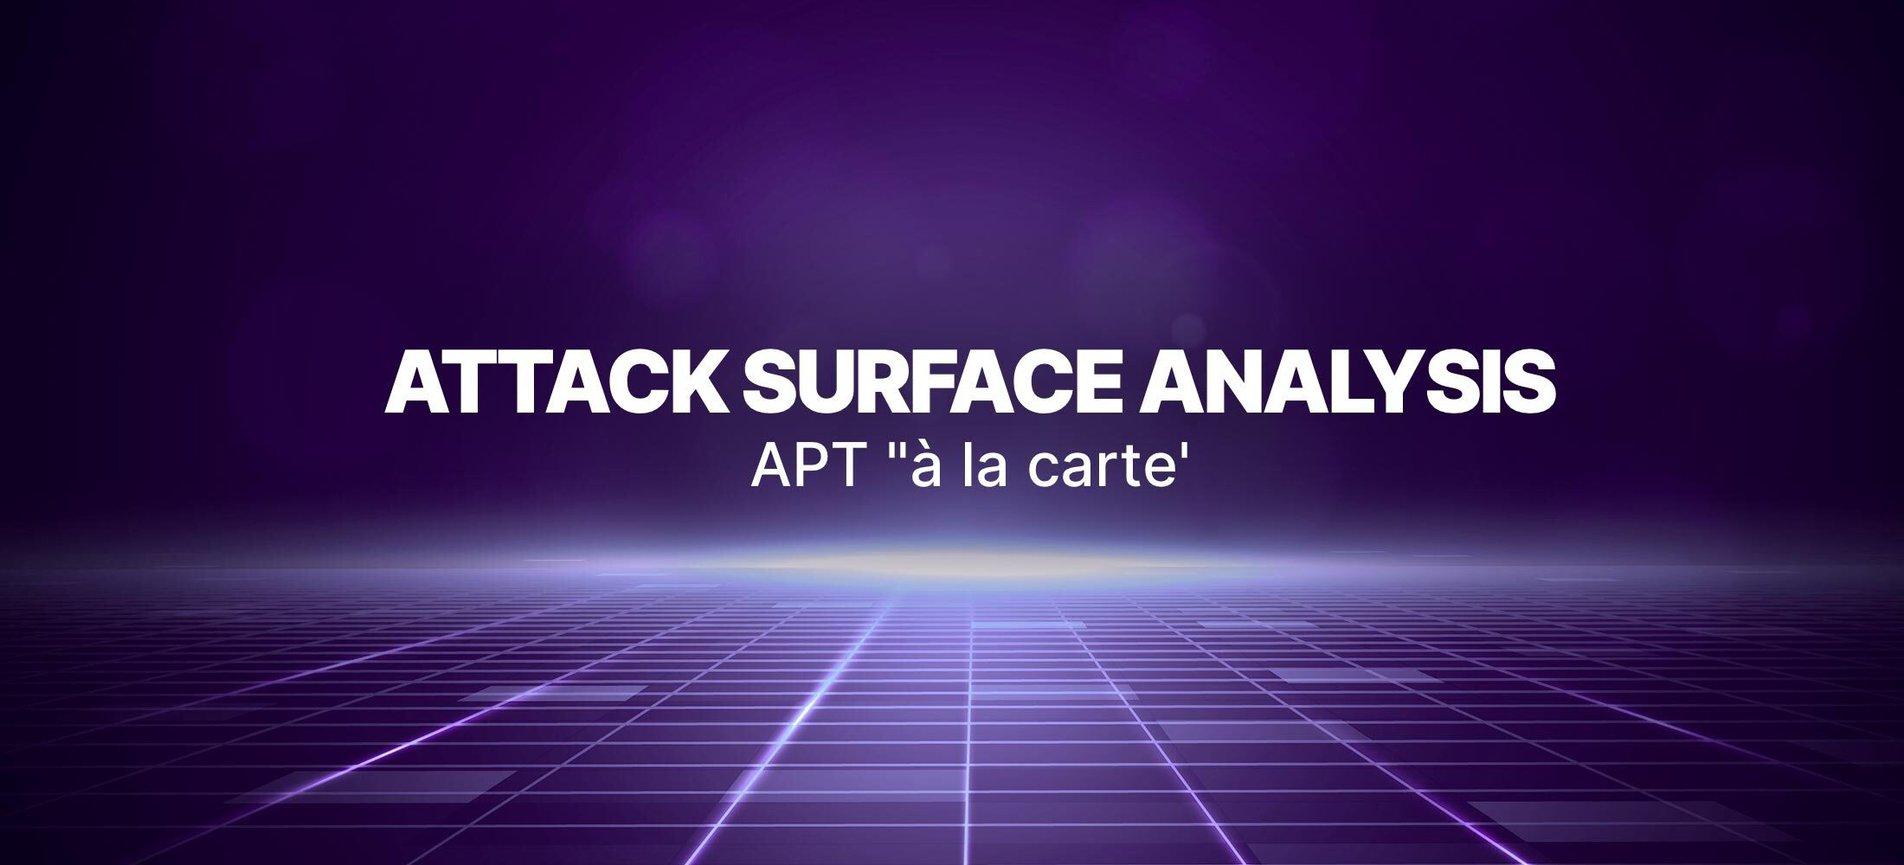 Attack Surface Analysis: APT